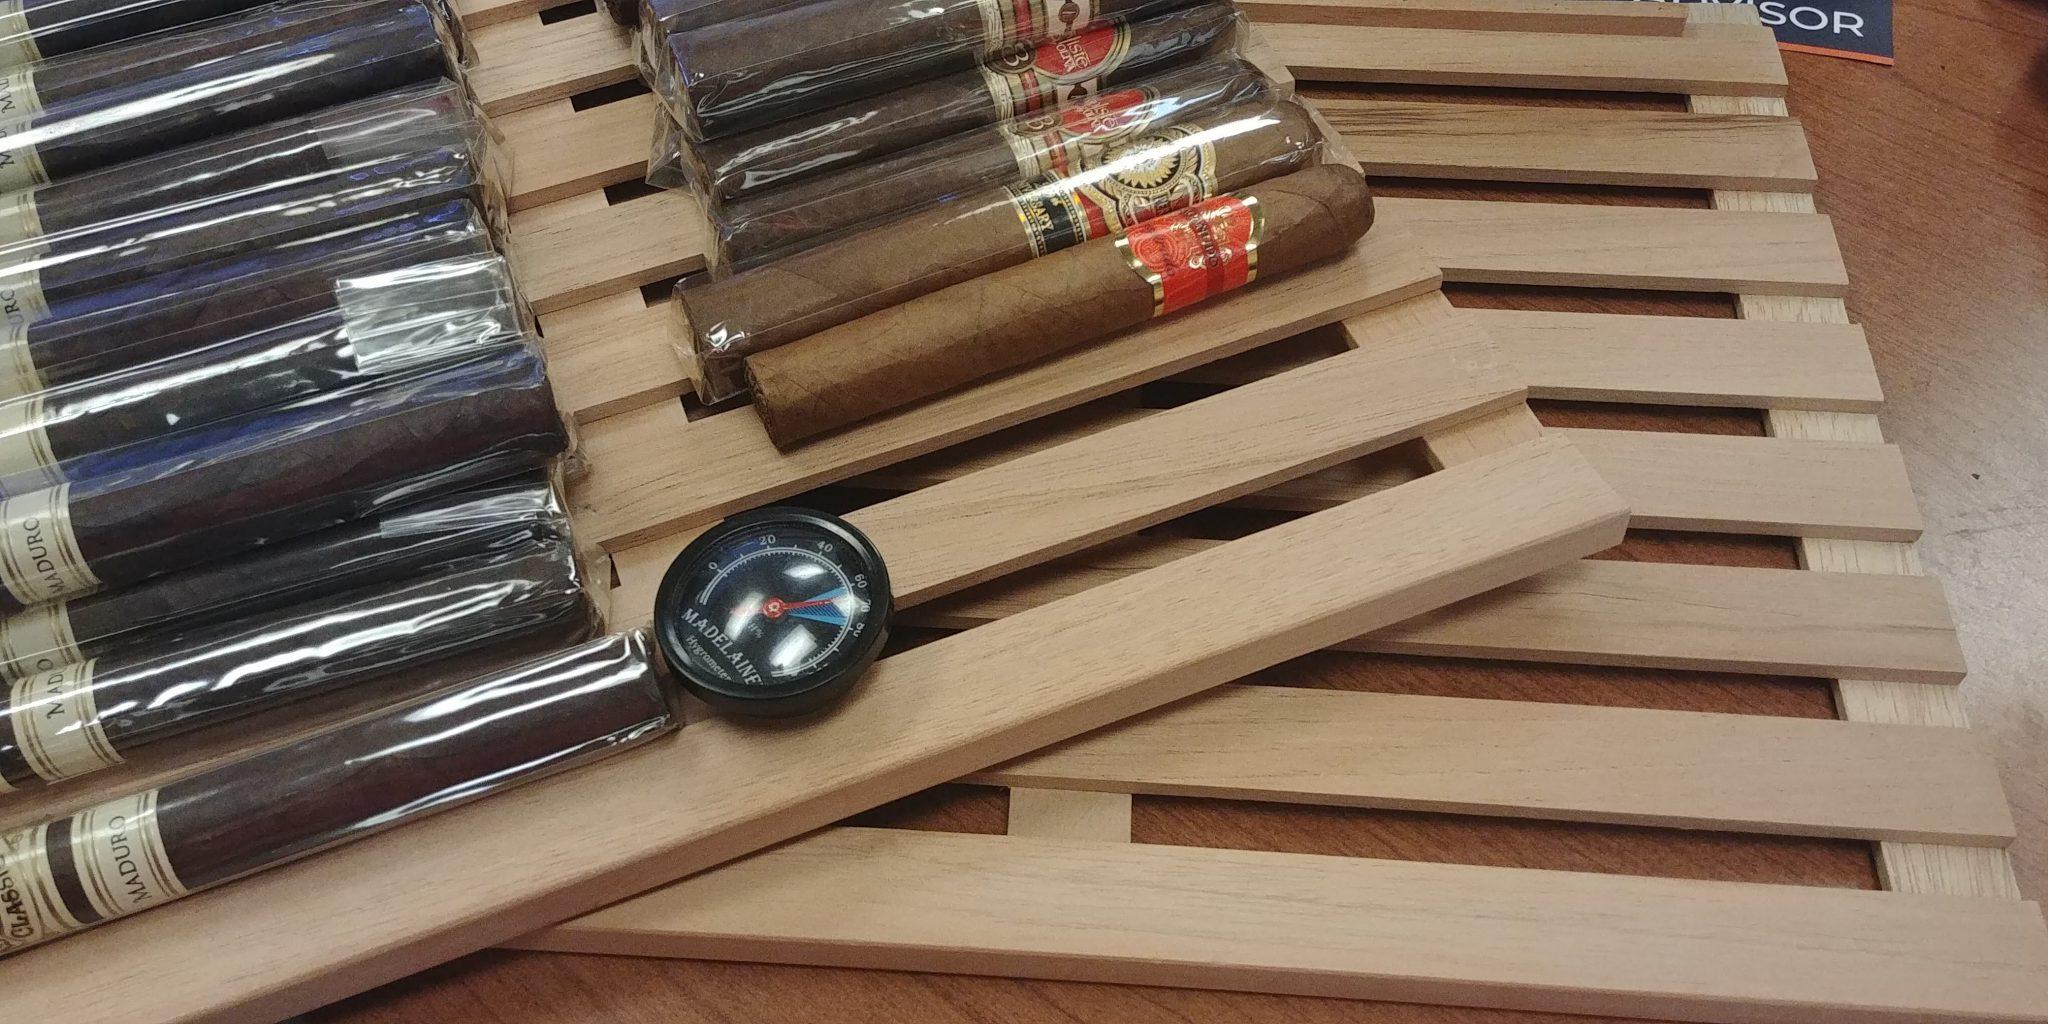 how to use a wineador newair cc-300h wineador review NewAir cigar Wineador shelves should be made of spanish cedar